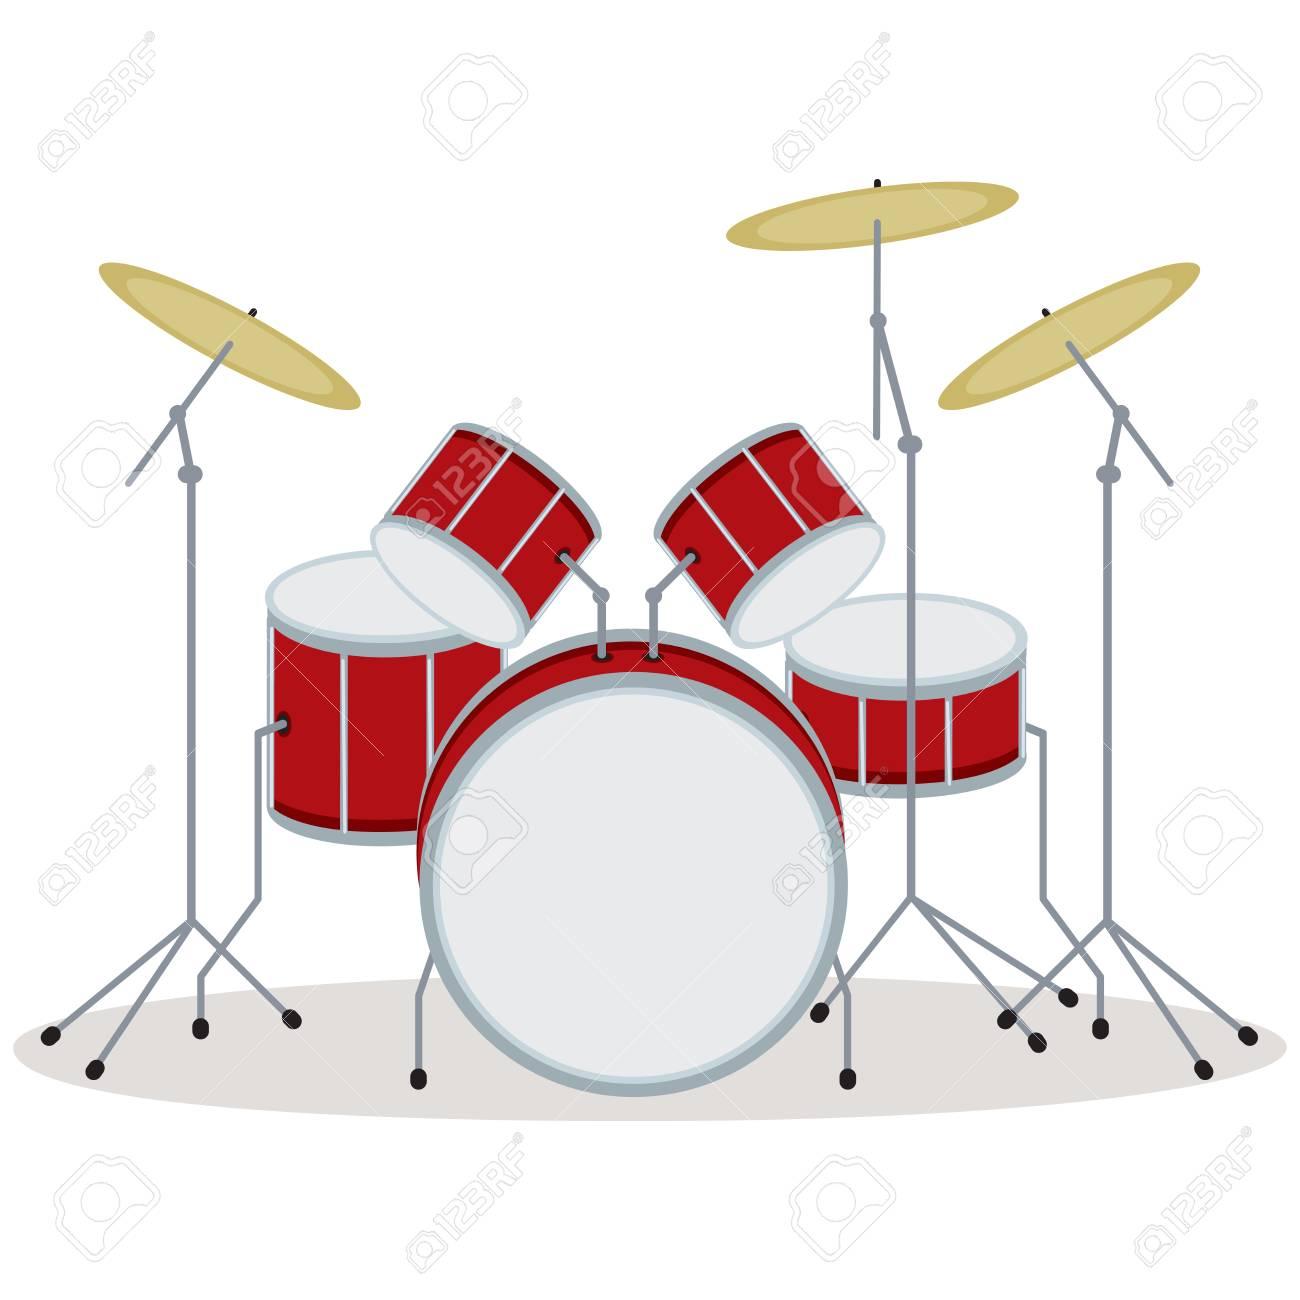 Drum set. Vector illustration of a drum kit..